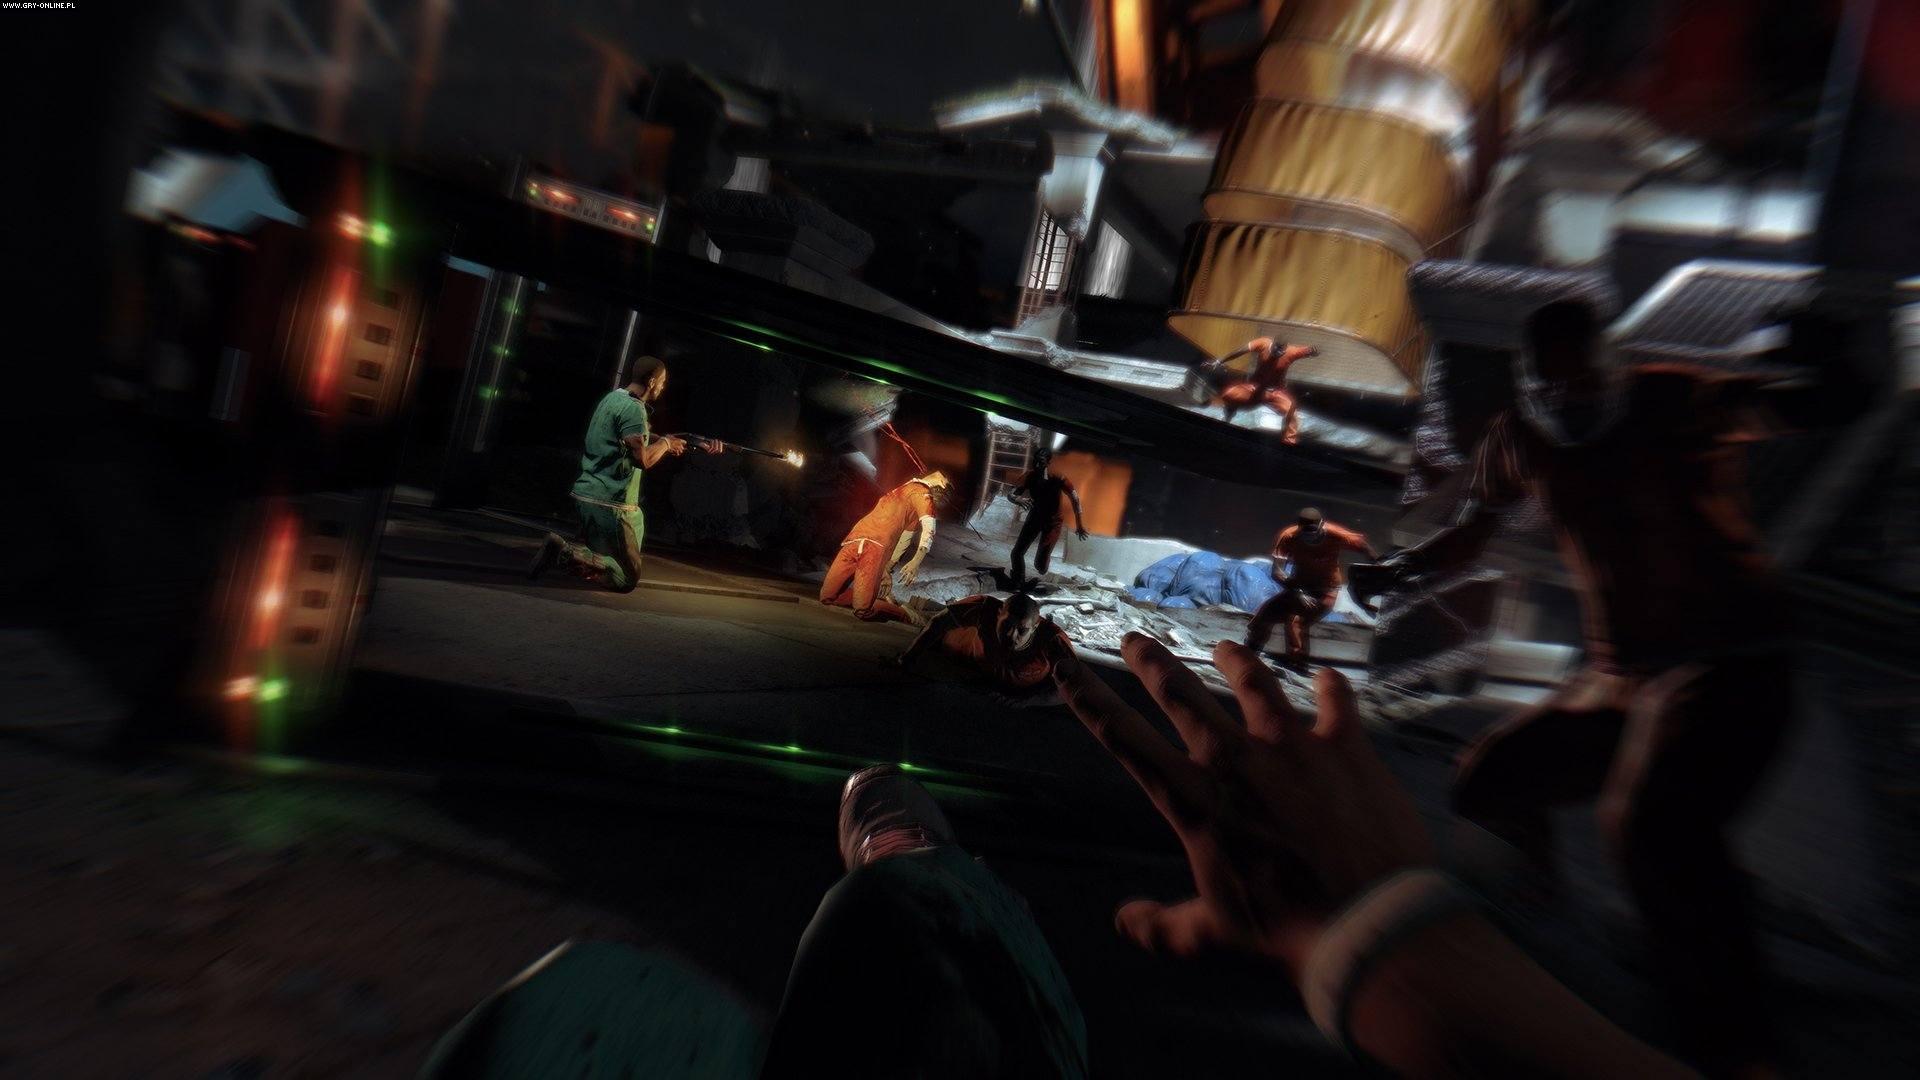 Dying Light image #5